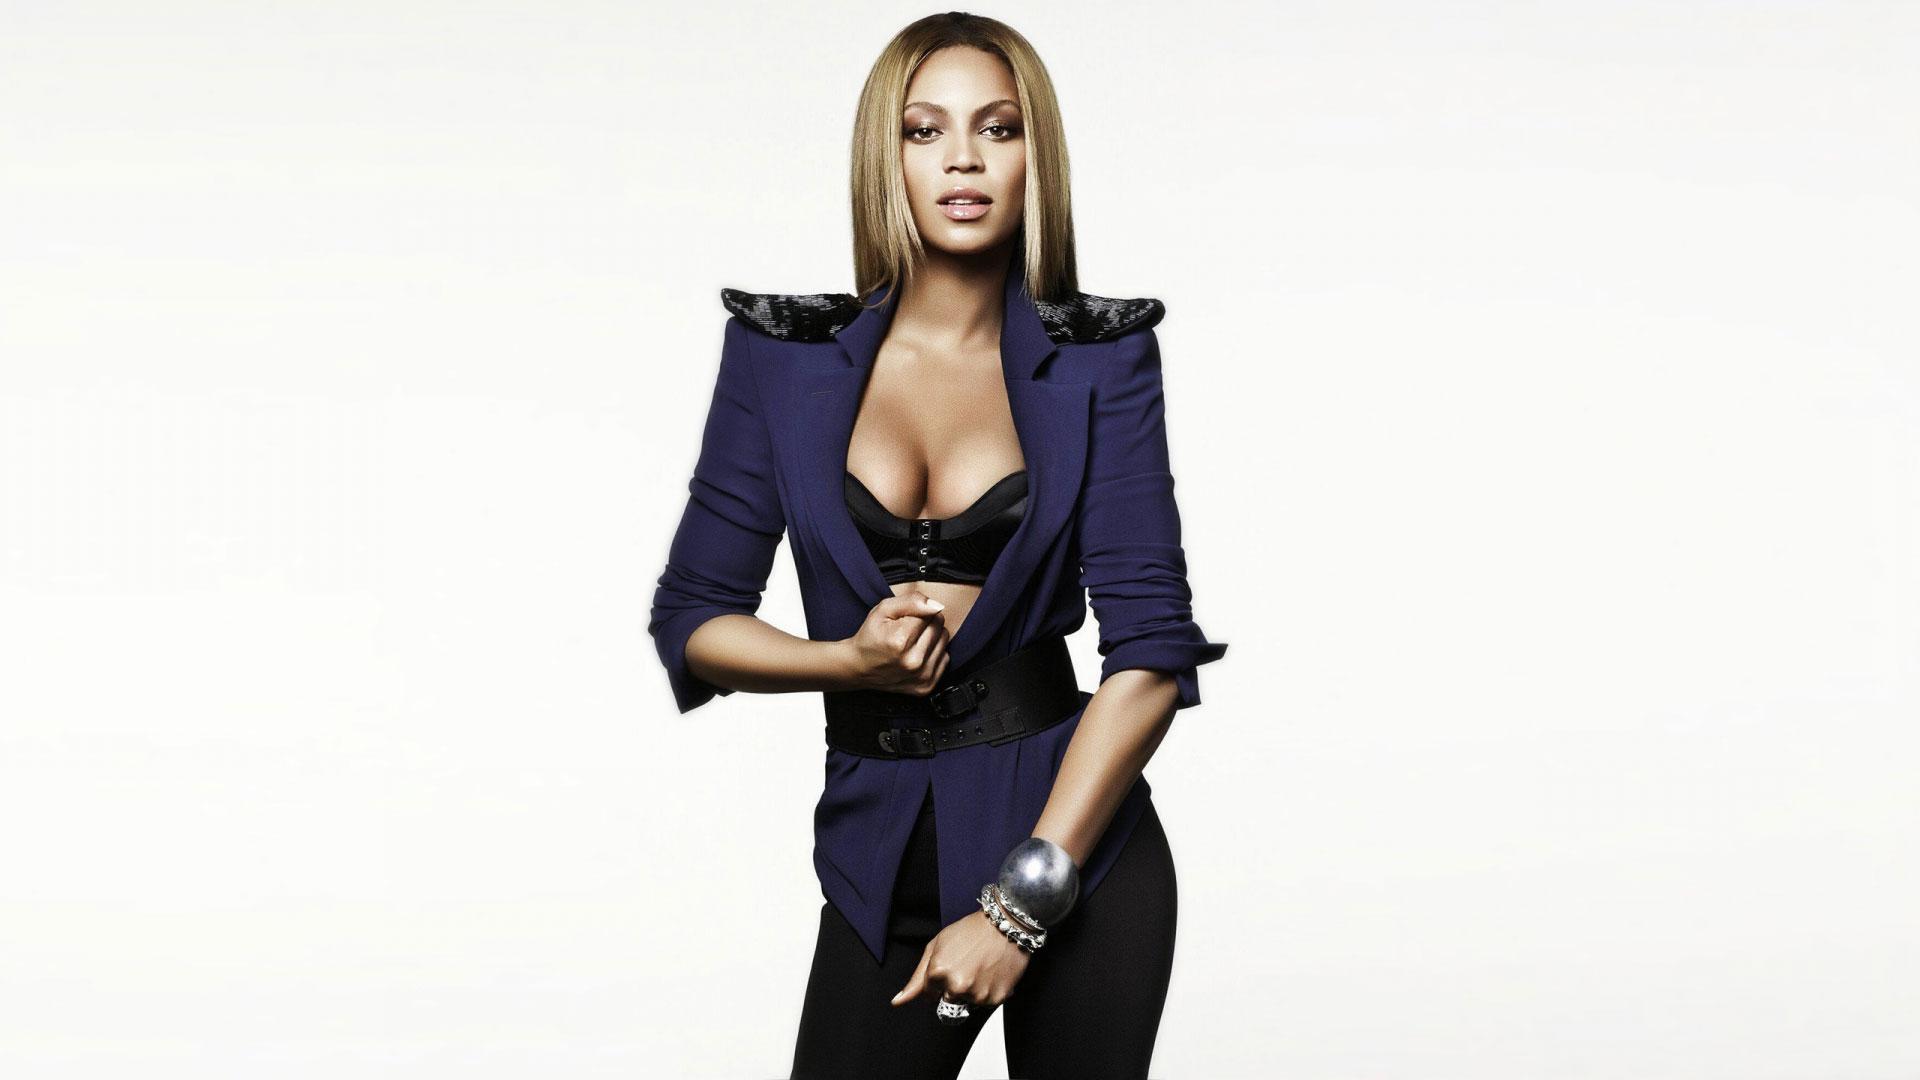 Beyonce White Background wwwpixsharkcom   Images 1920x1080